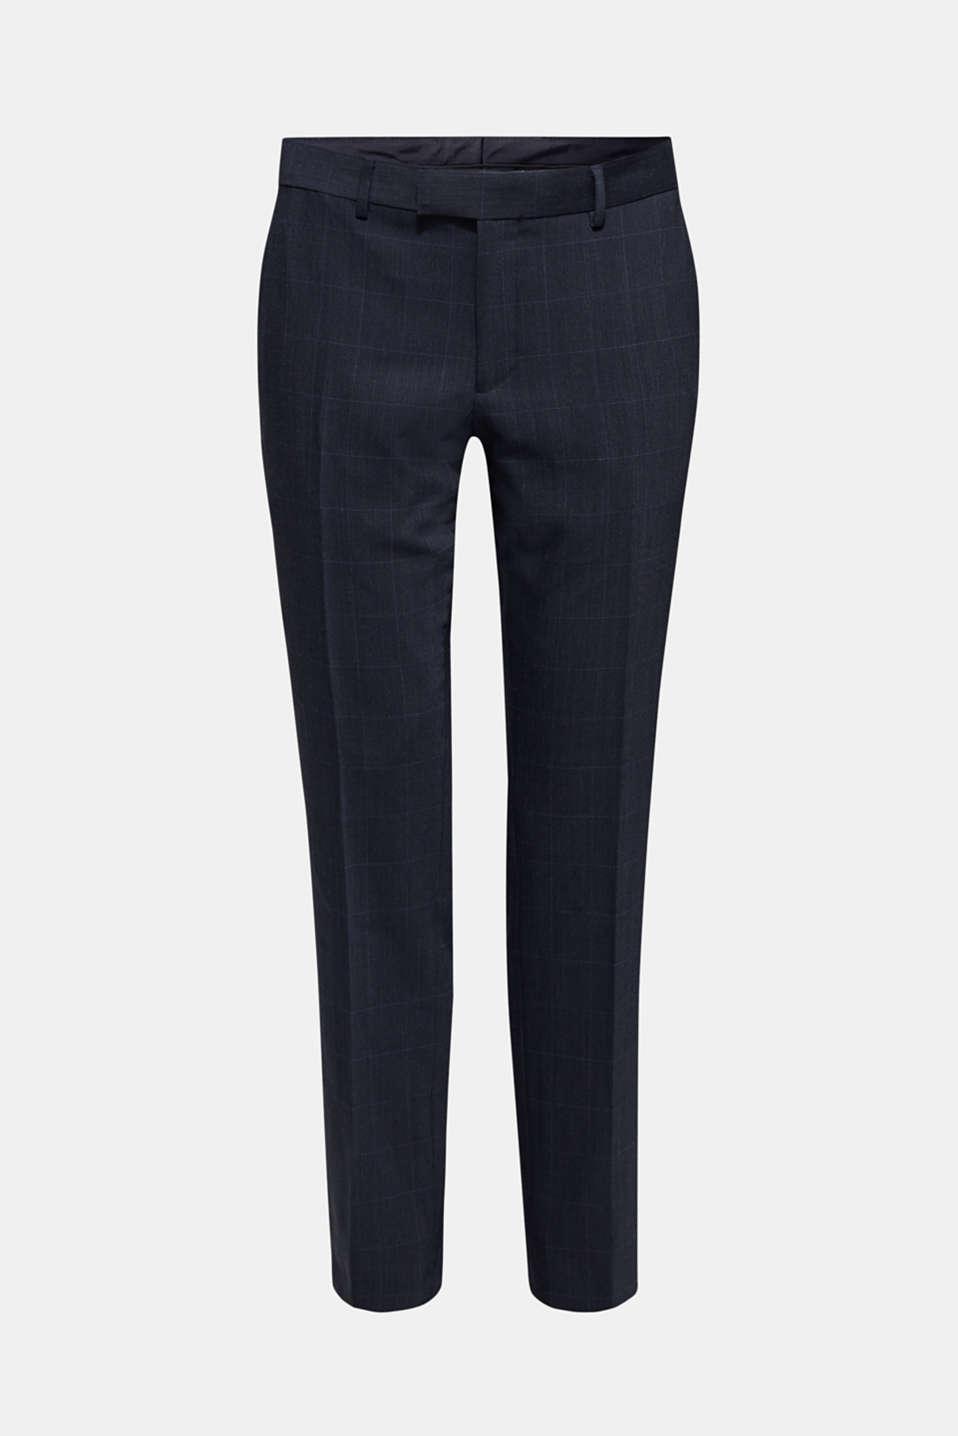 Pants suit, DARK BLUE, detail image number 6